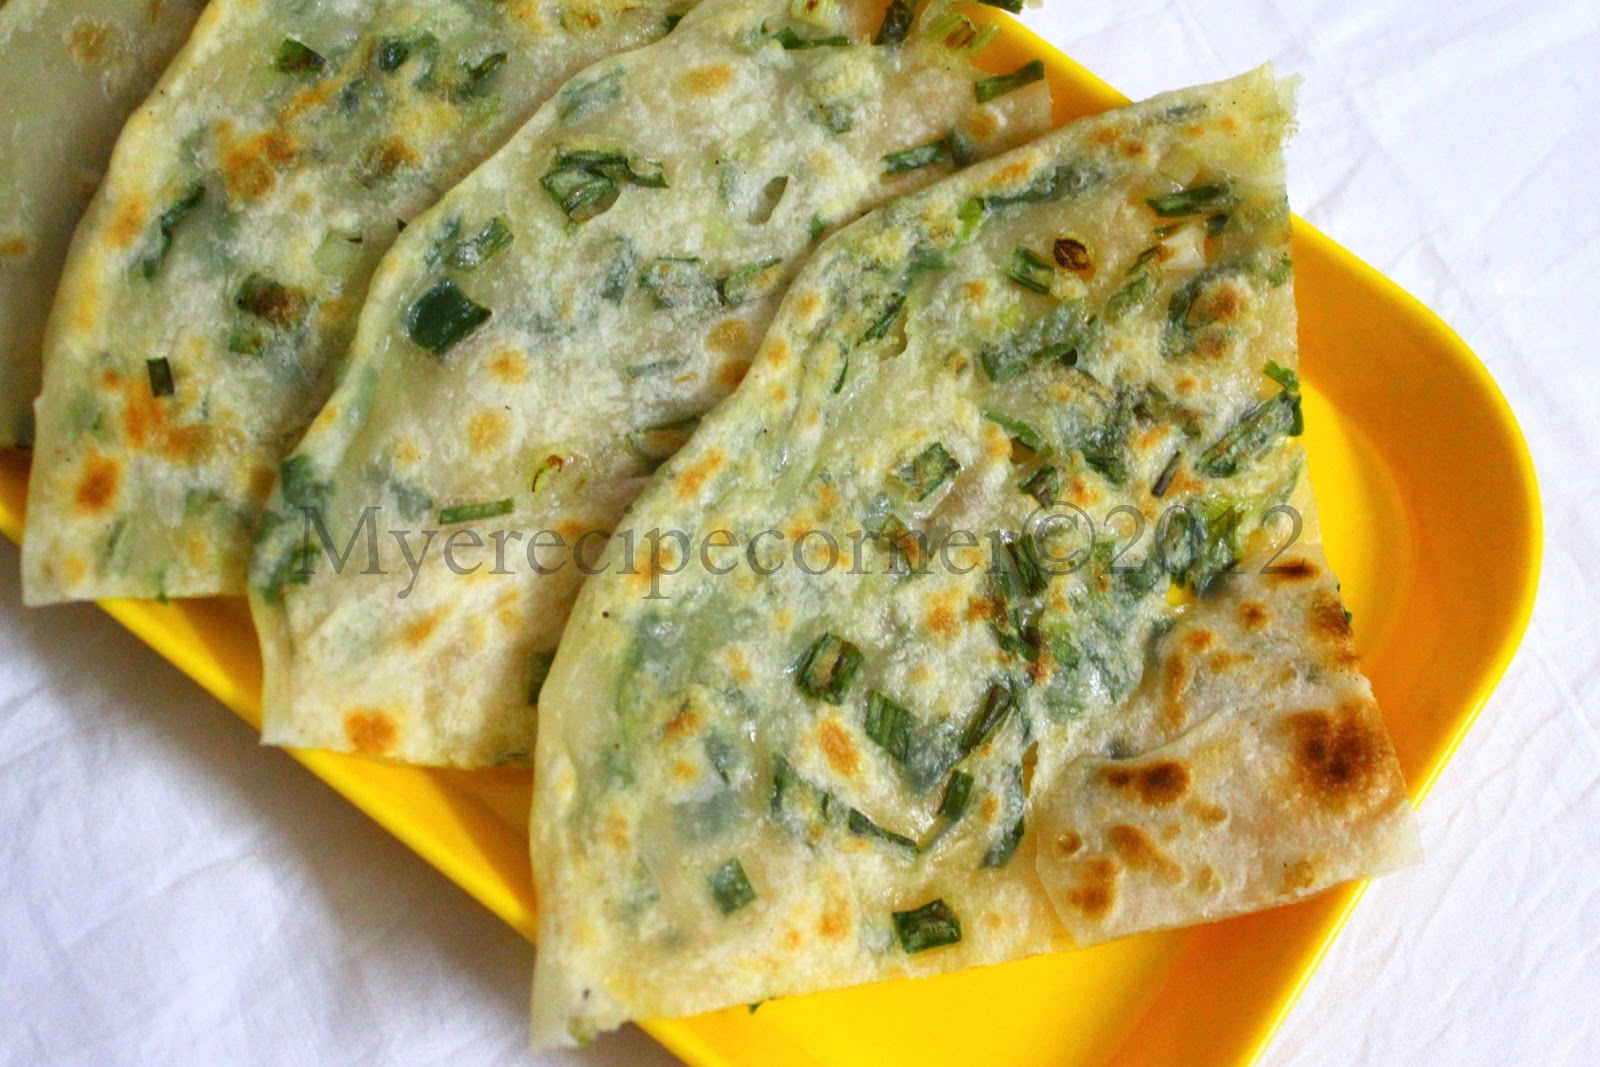 Mye's Kitchen: Cong You Bing( Chinese Scallion Pancake Recipe